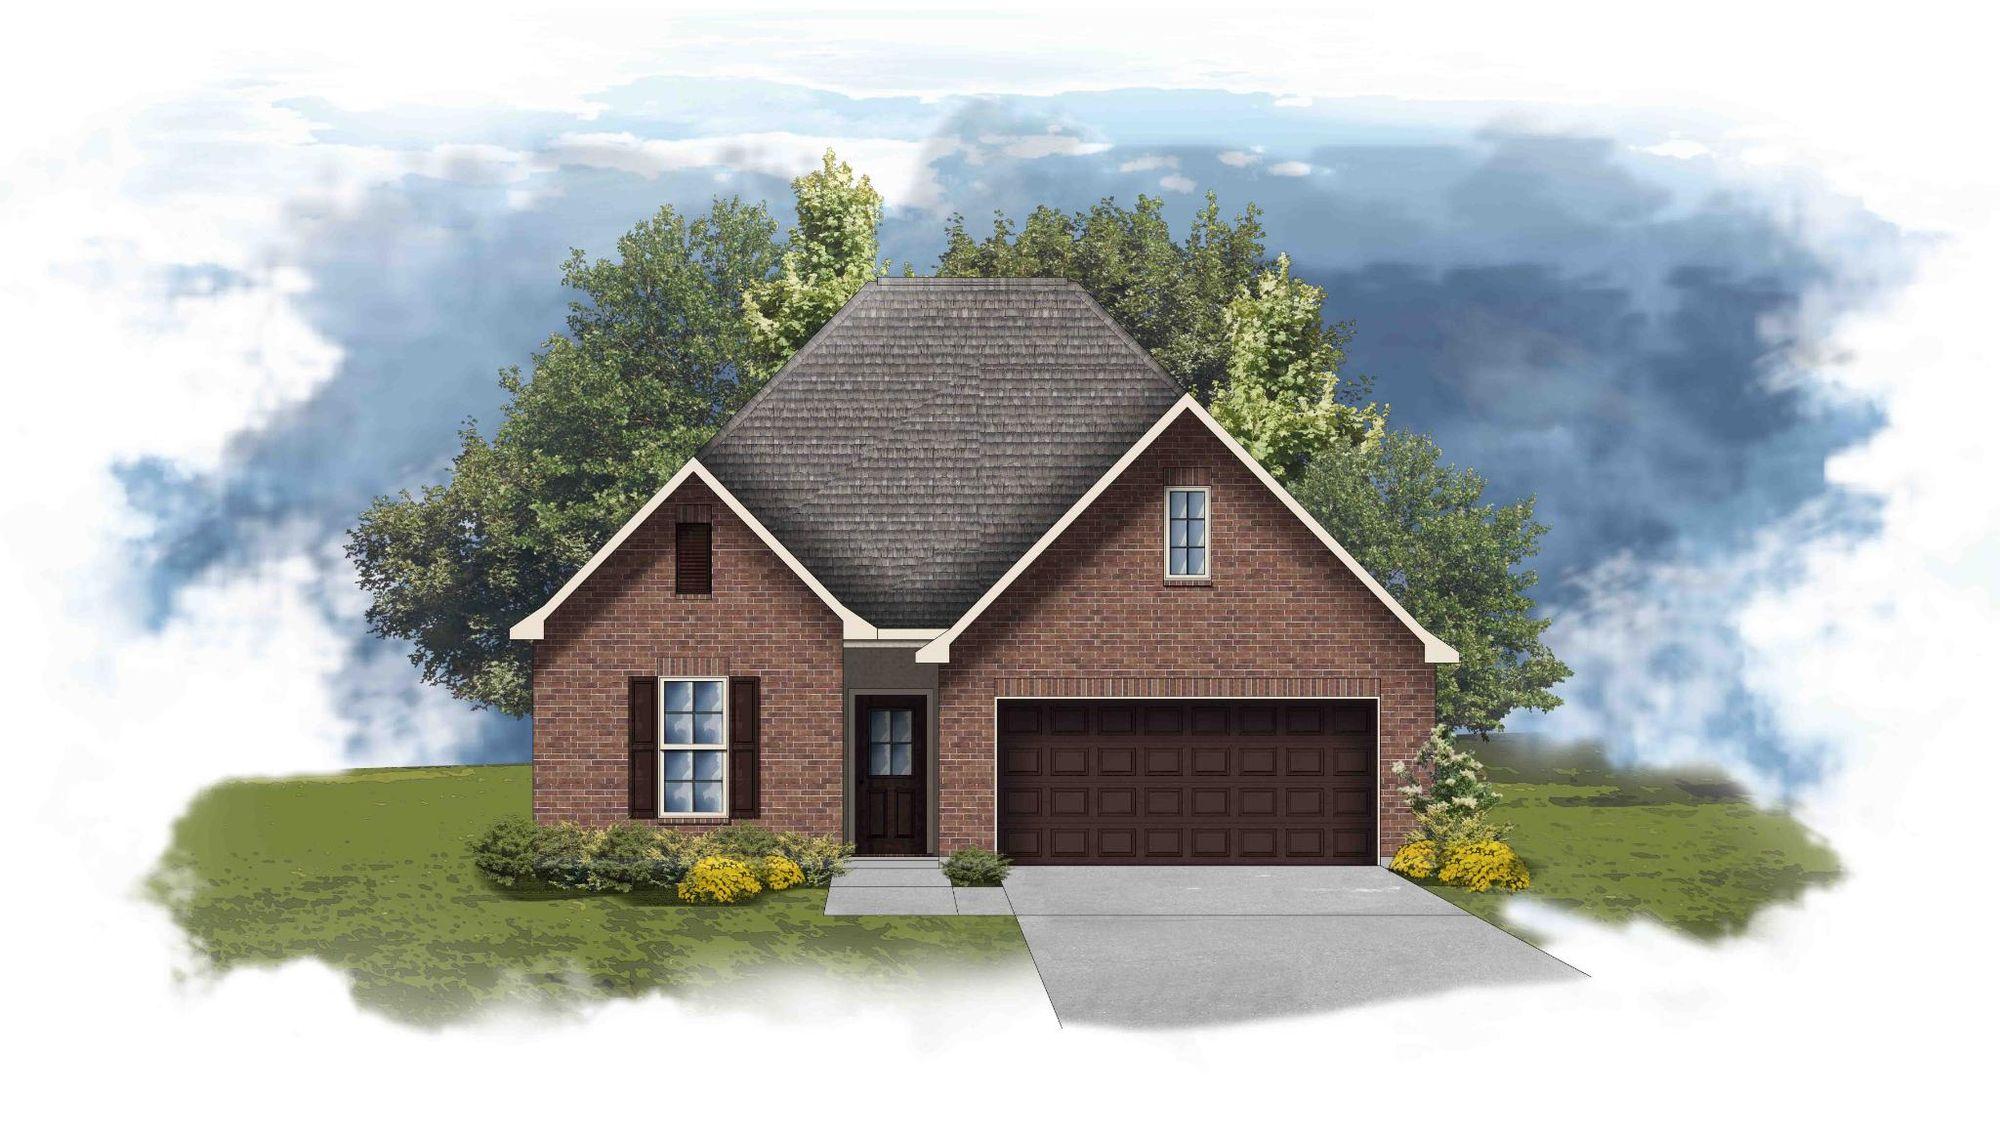 Fleetwood II A - Front Elevation - DSLD Homes